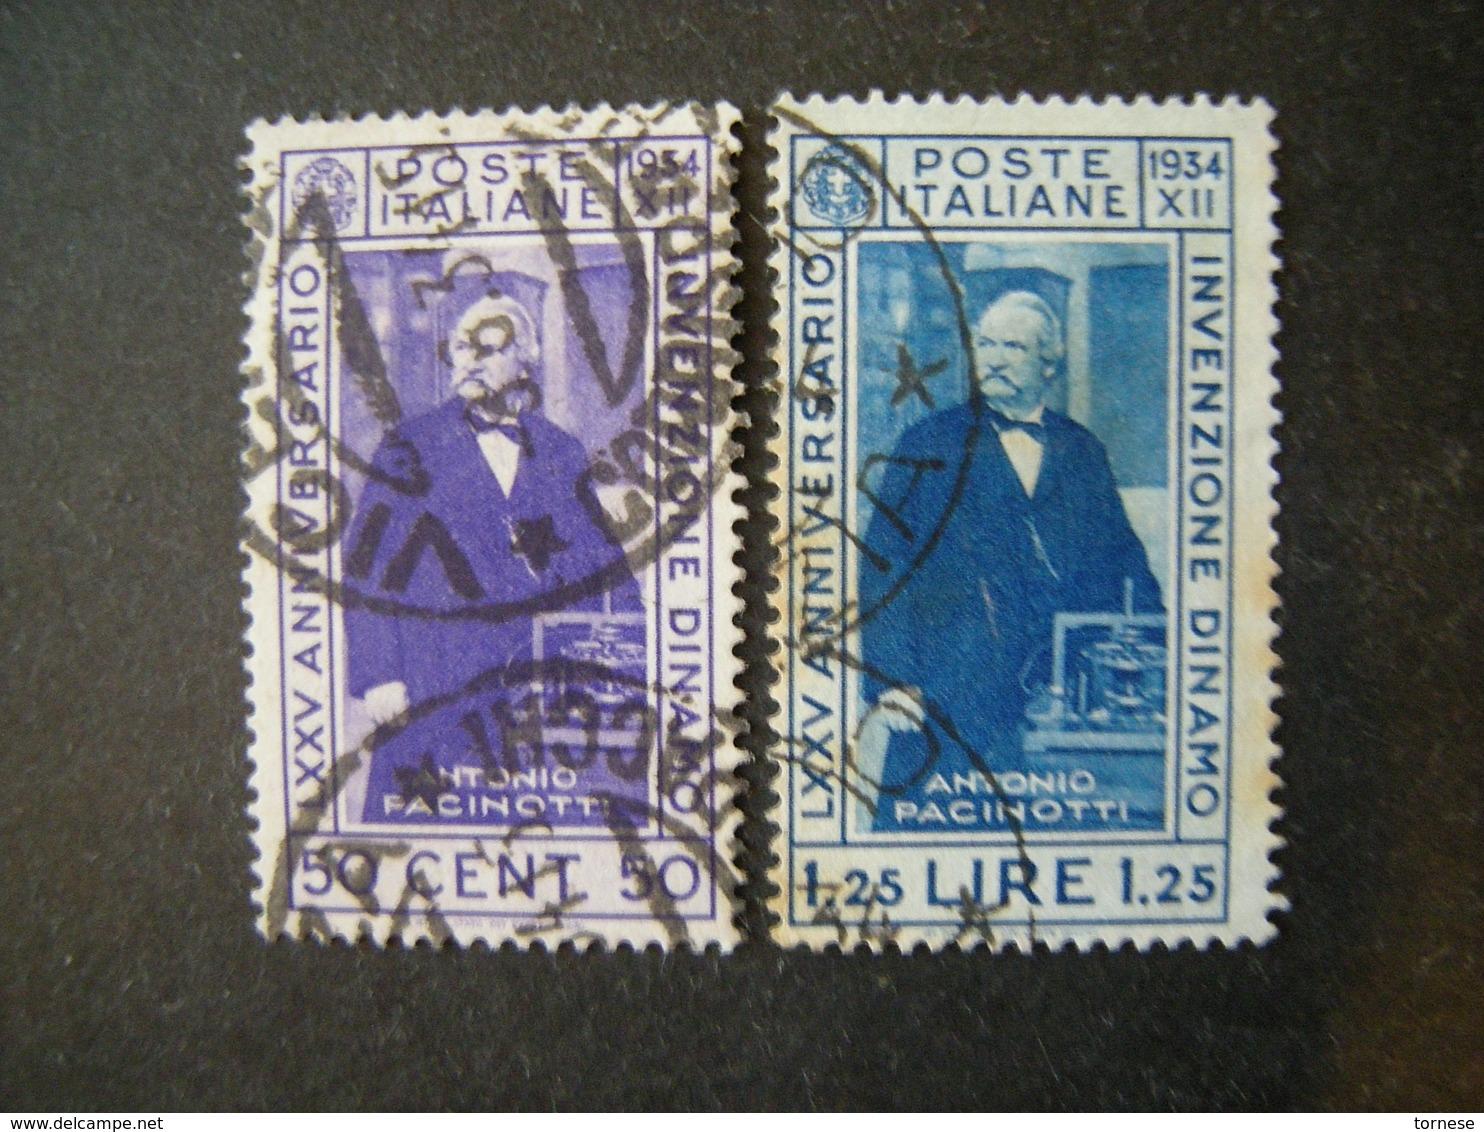 1935 - PACINOTTI, Serie Compl. Usata , 2 Val. TTB,  OCCASIONE - 1900-44 Vittorio Emanuele III